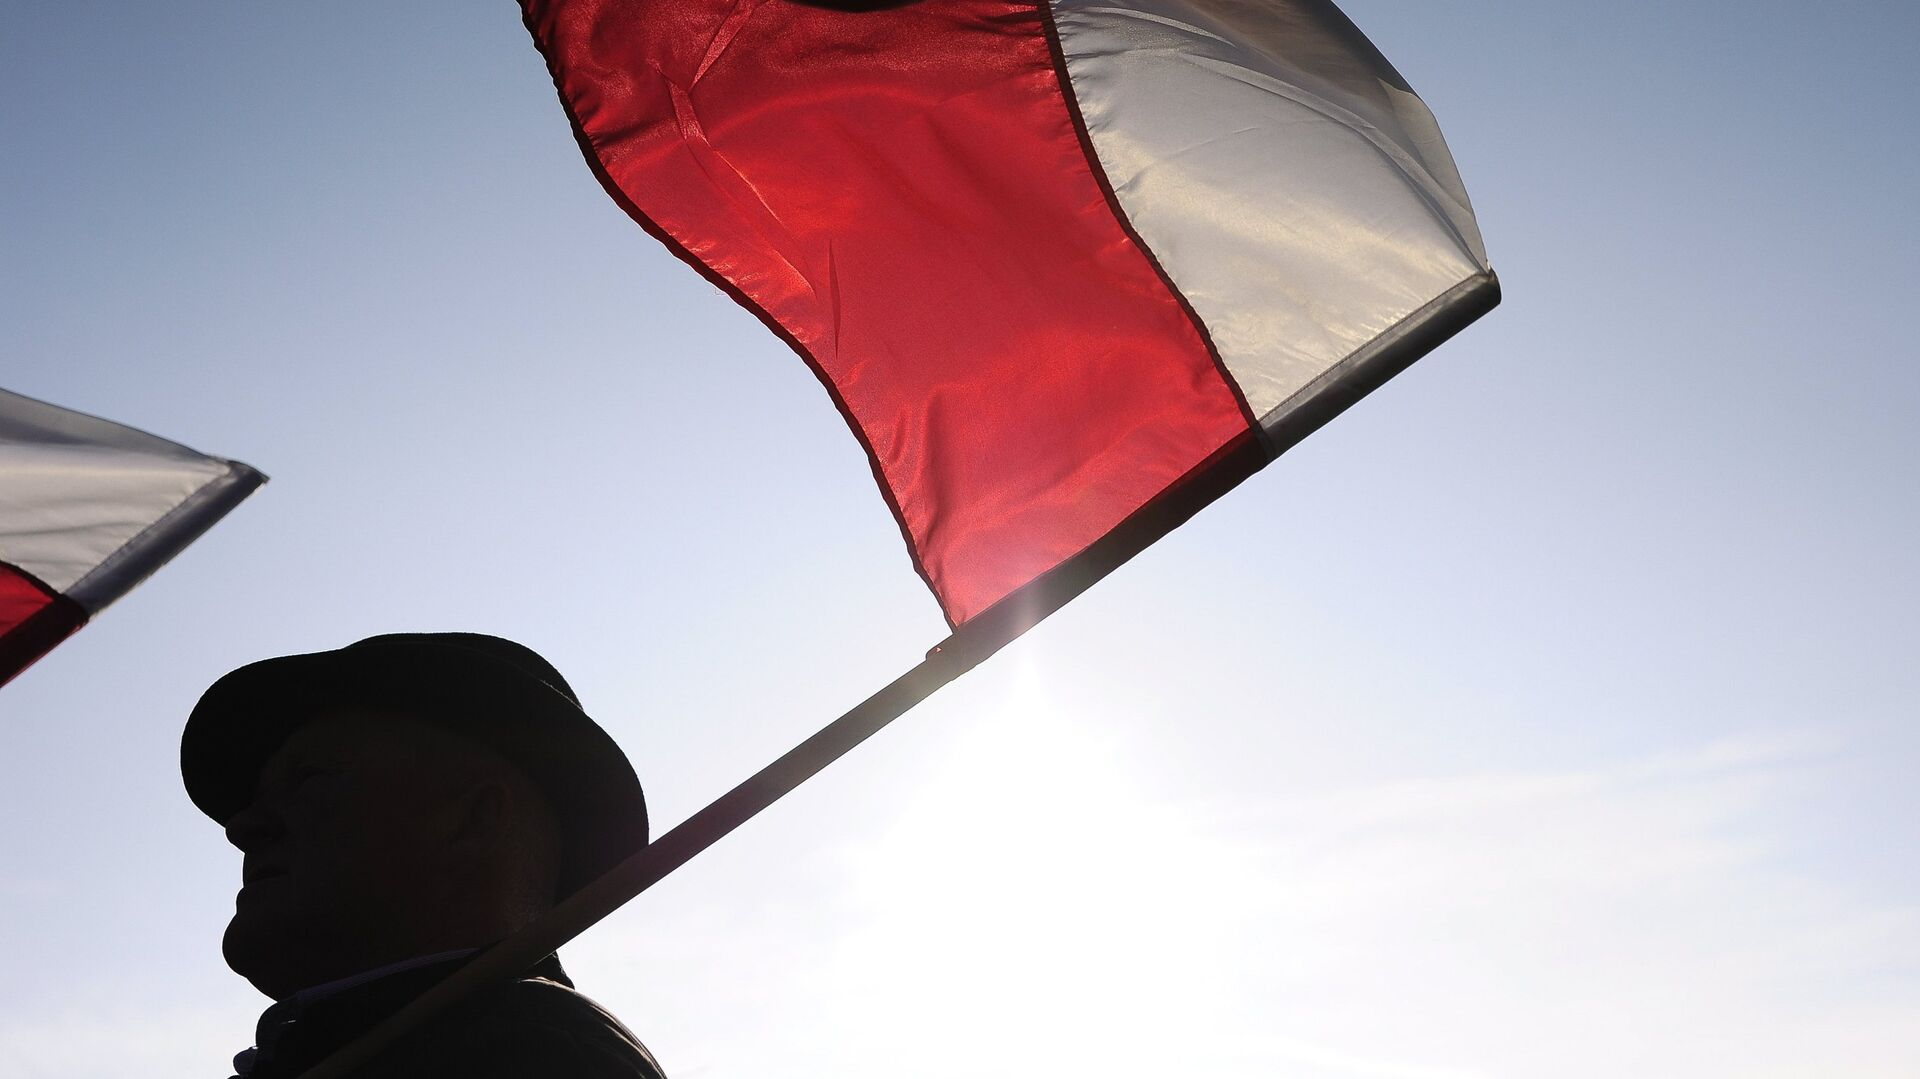 Мужчина с флагом Польши - РИА Новости, 1920, 26.05.2021